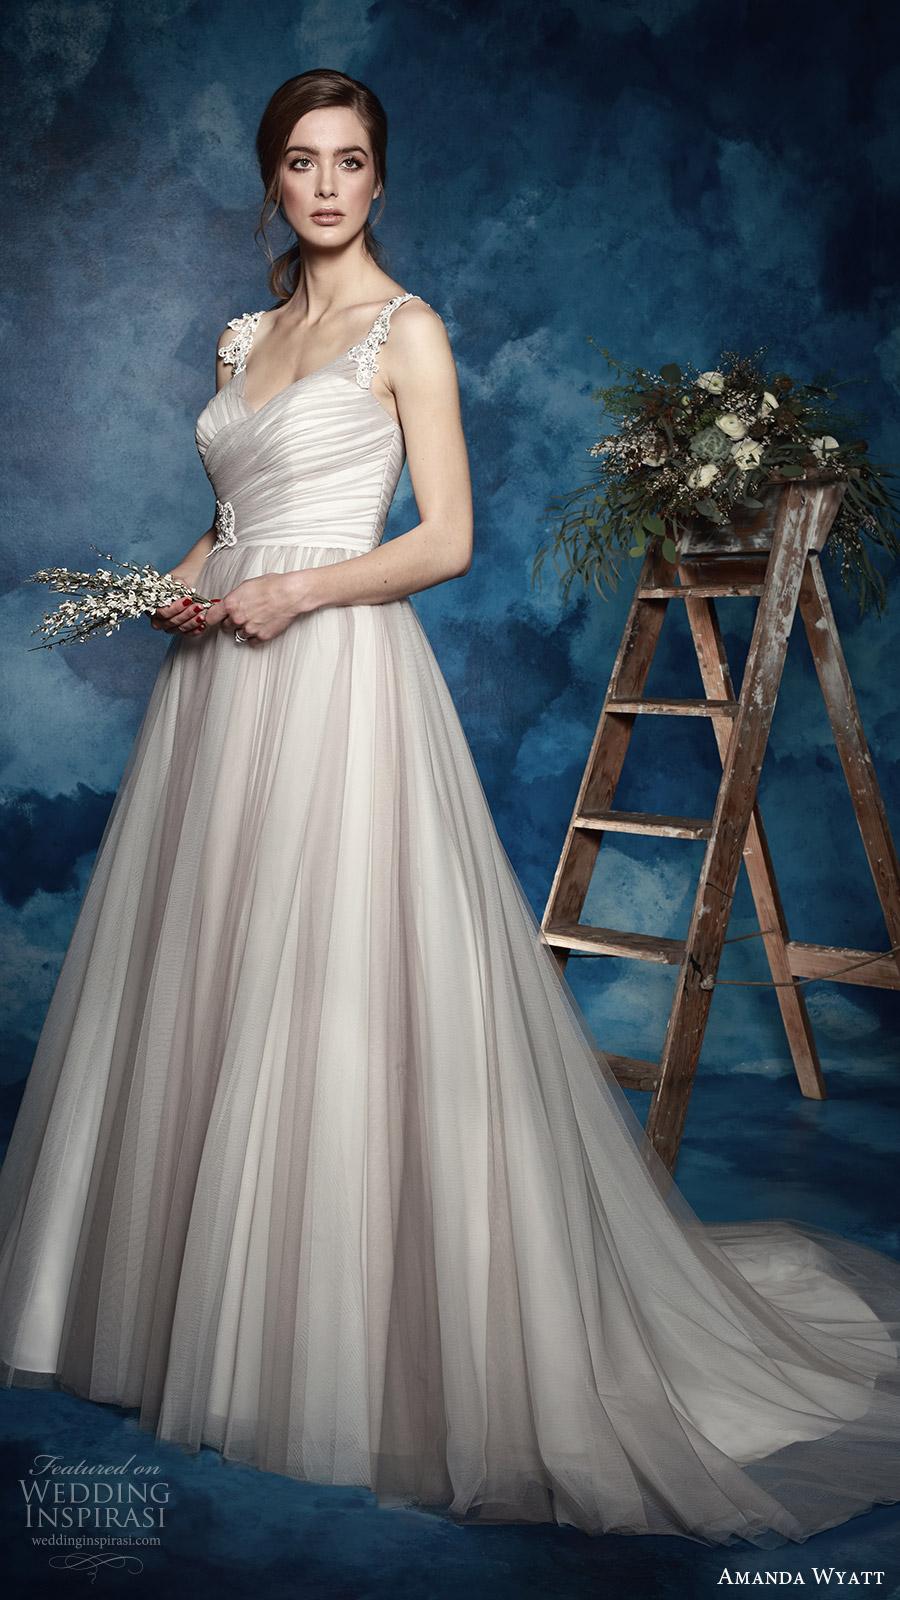 amanda wyatt bridal 2017 sleeveless lace straps vneck ruched surplic bodice a line wedding dress (north) mv grey color romantic train